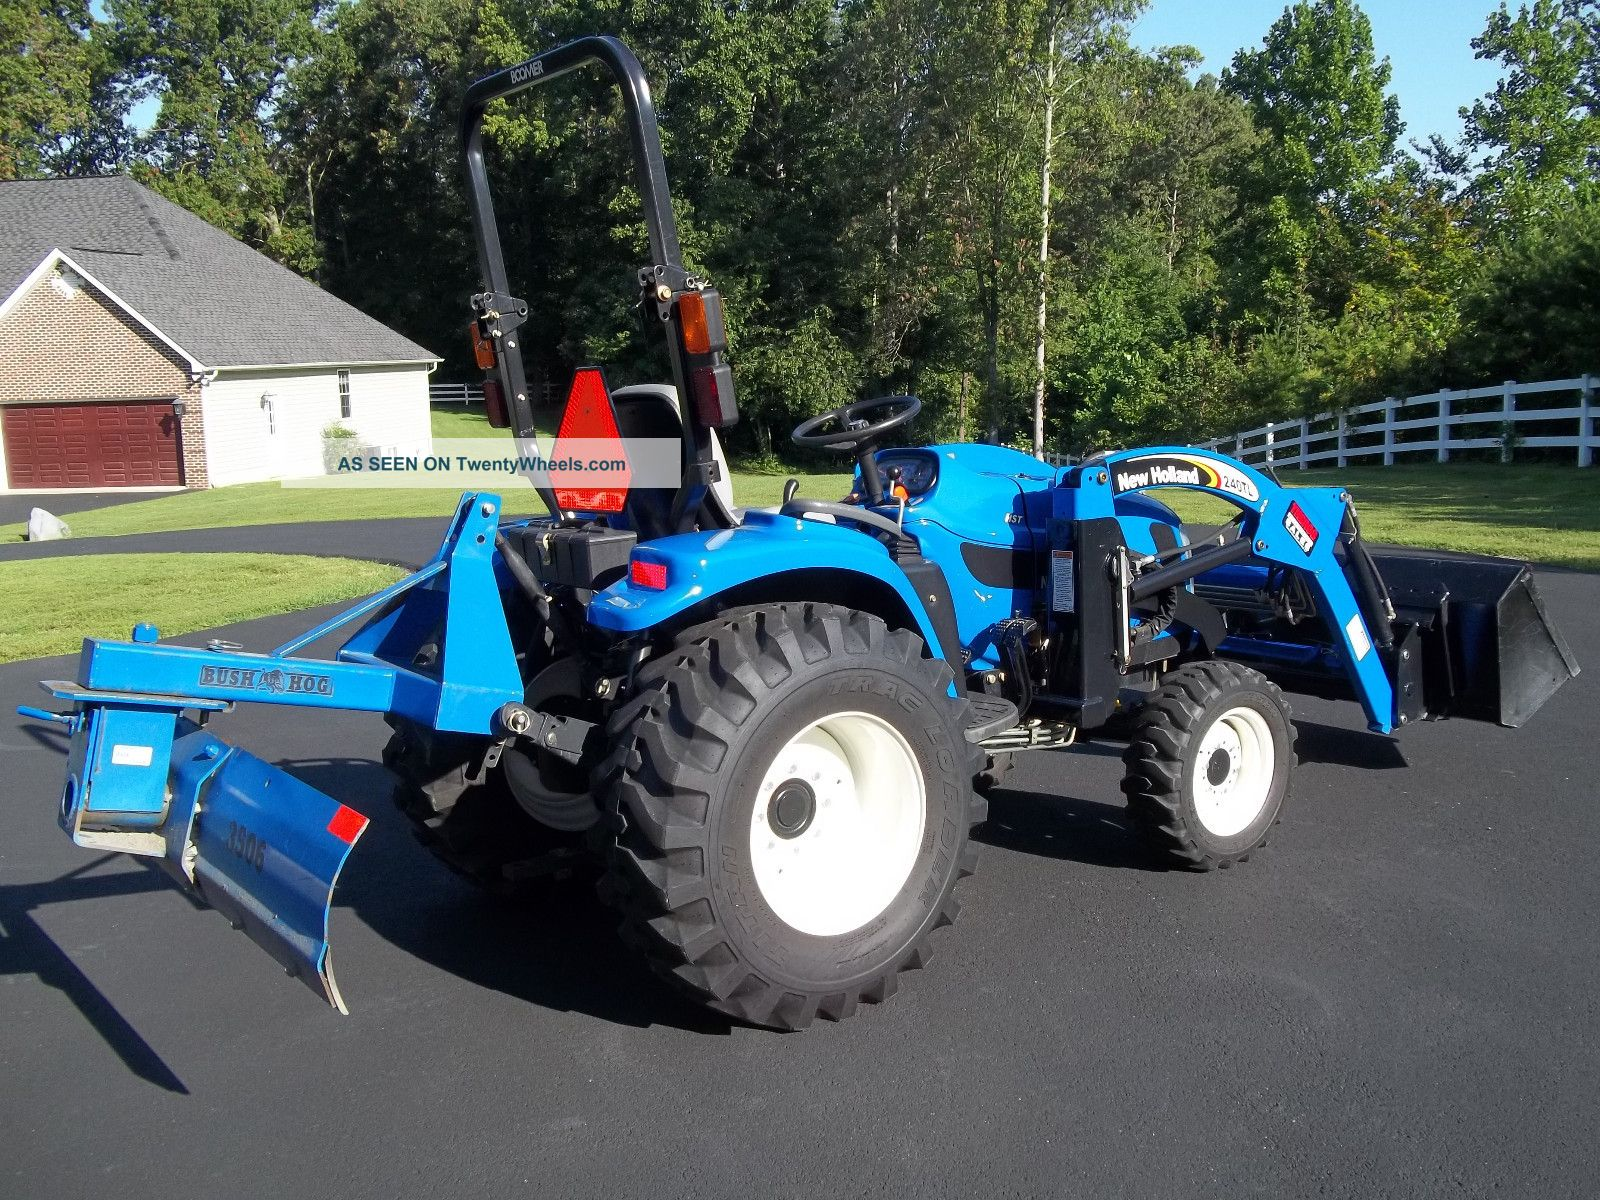 2008 holland tc34da 4x4 diesel tractor only 97 hours. Black Bedroom Furniture Sets. Home Design Ideas